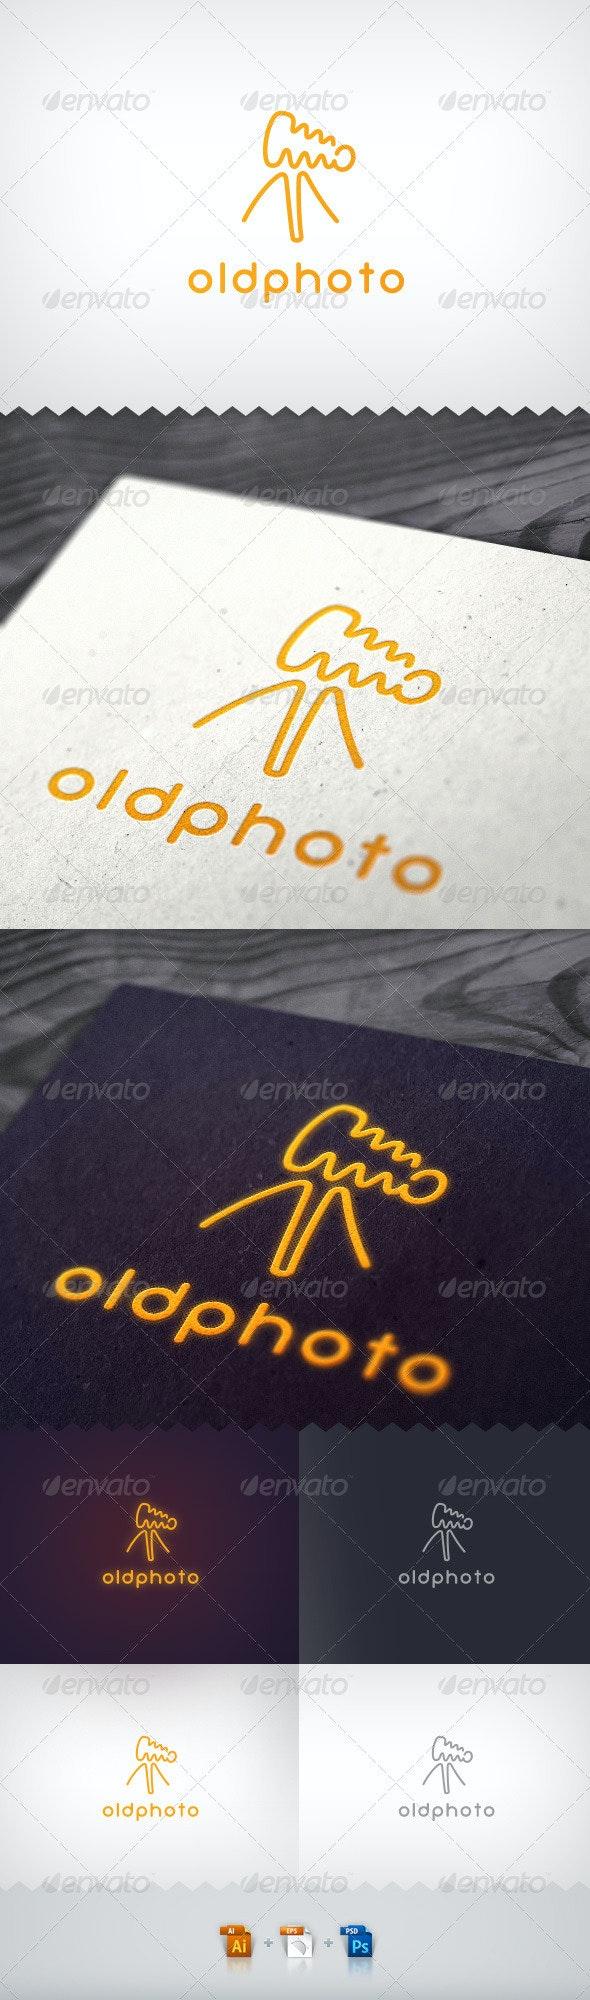 Old Photo Camera Neon Logo - Objects Logo Templates